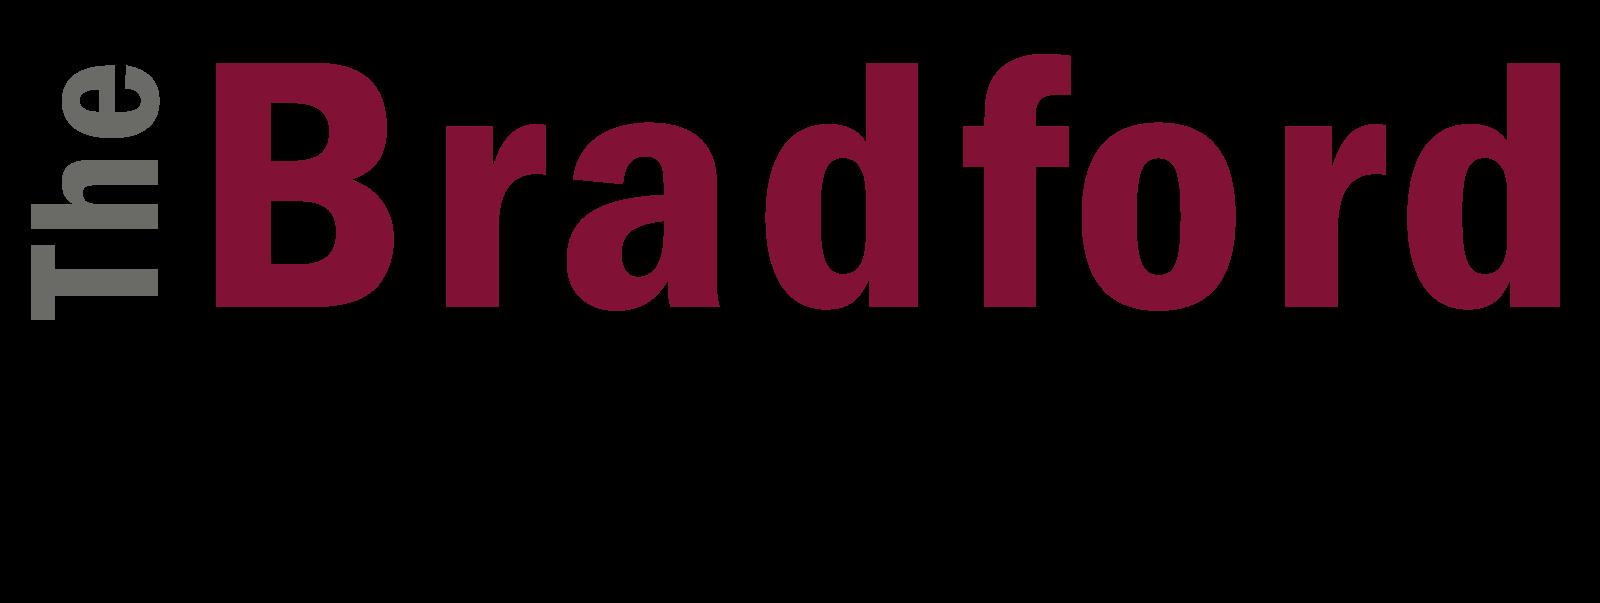 The Bradford logo